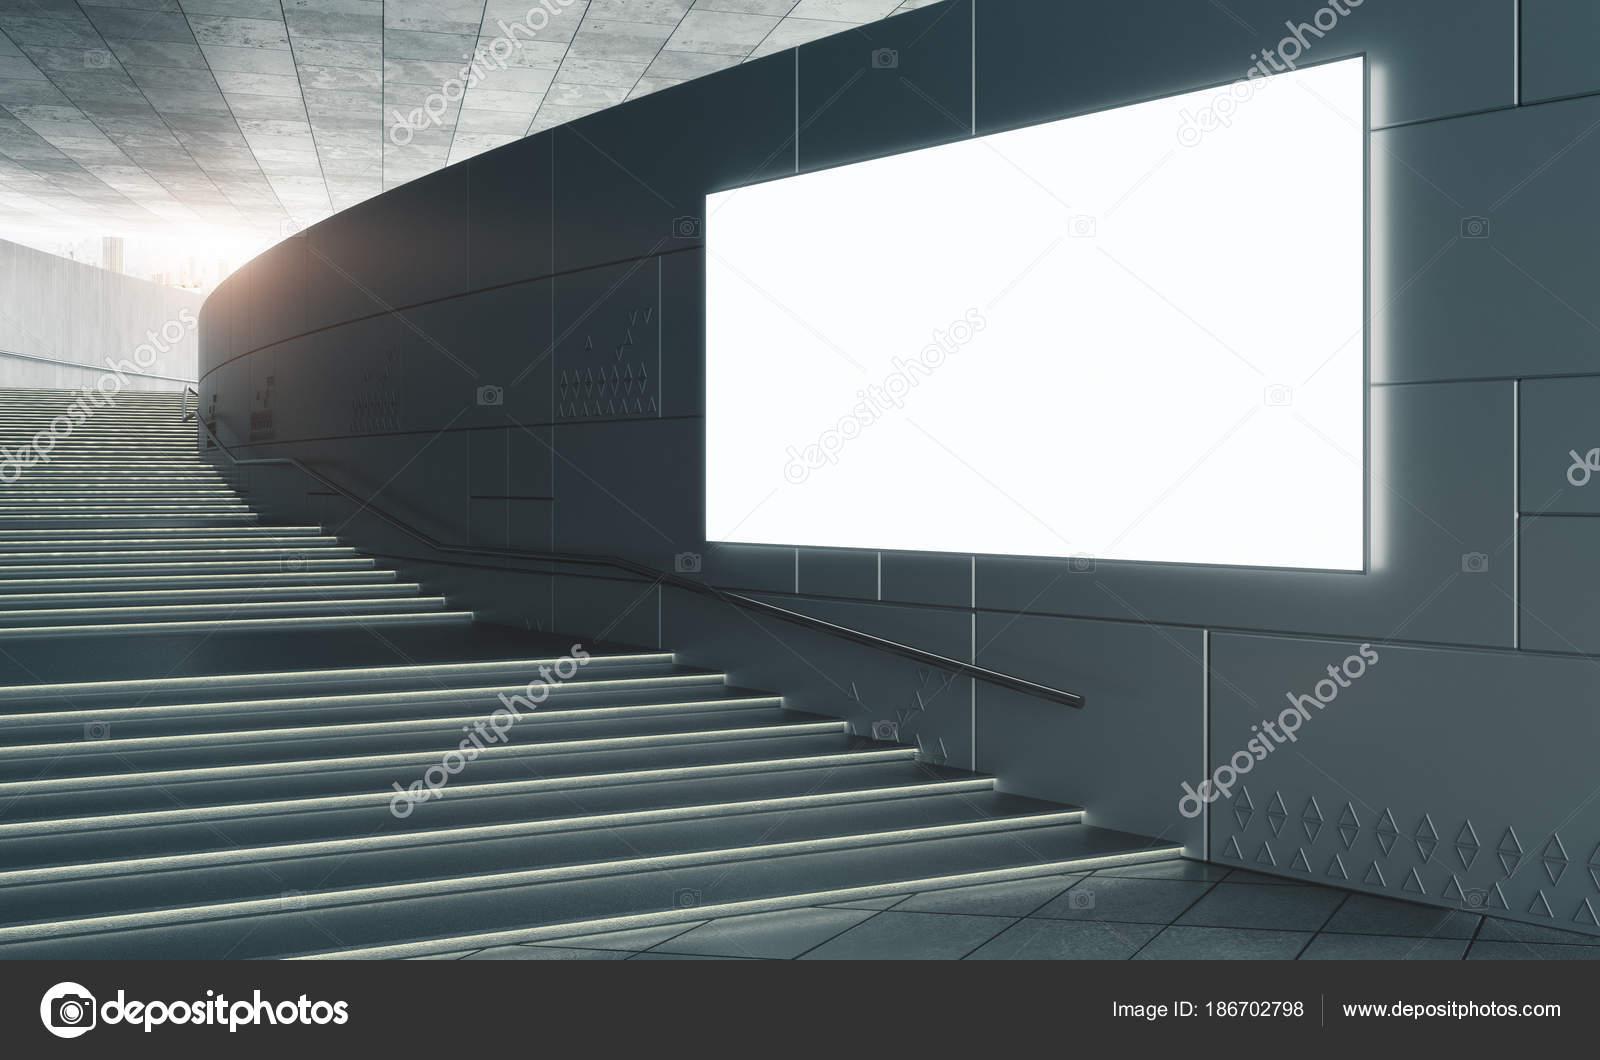 Betonnen trappen met lege poster u2014 stockfoto © peshkov #186702798